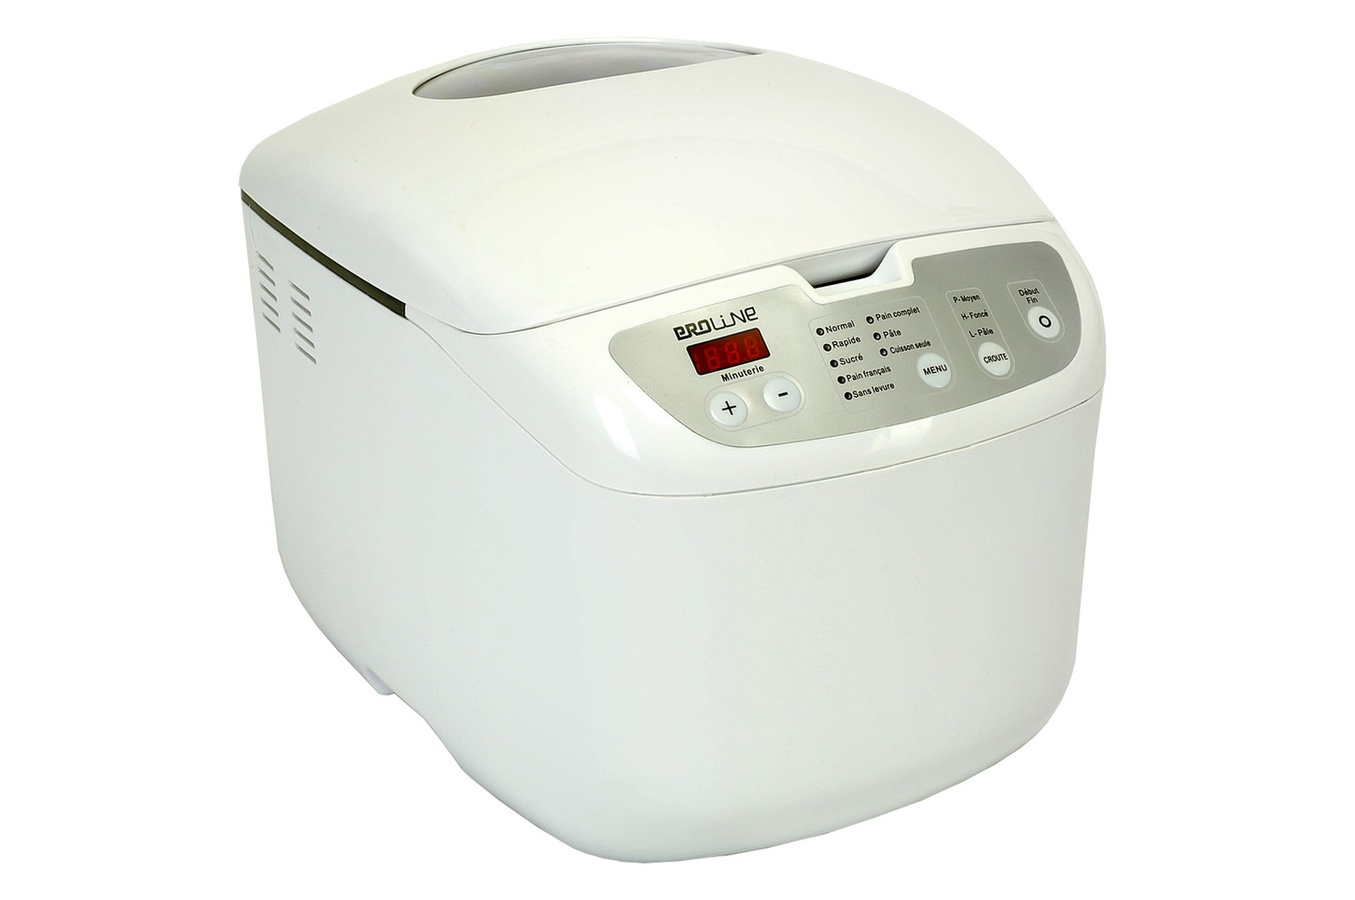 BM105